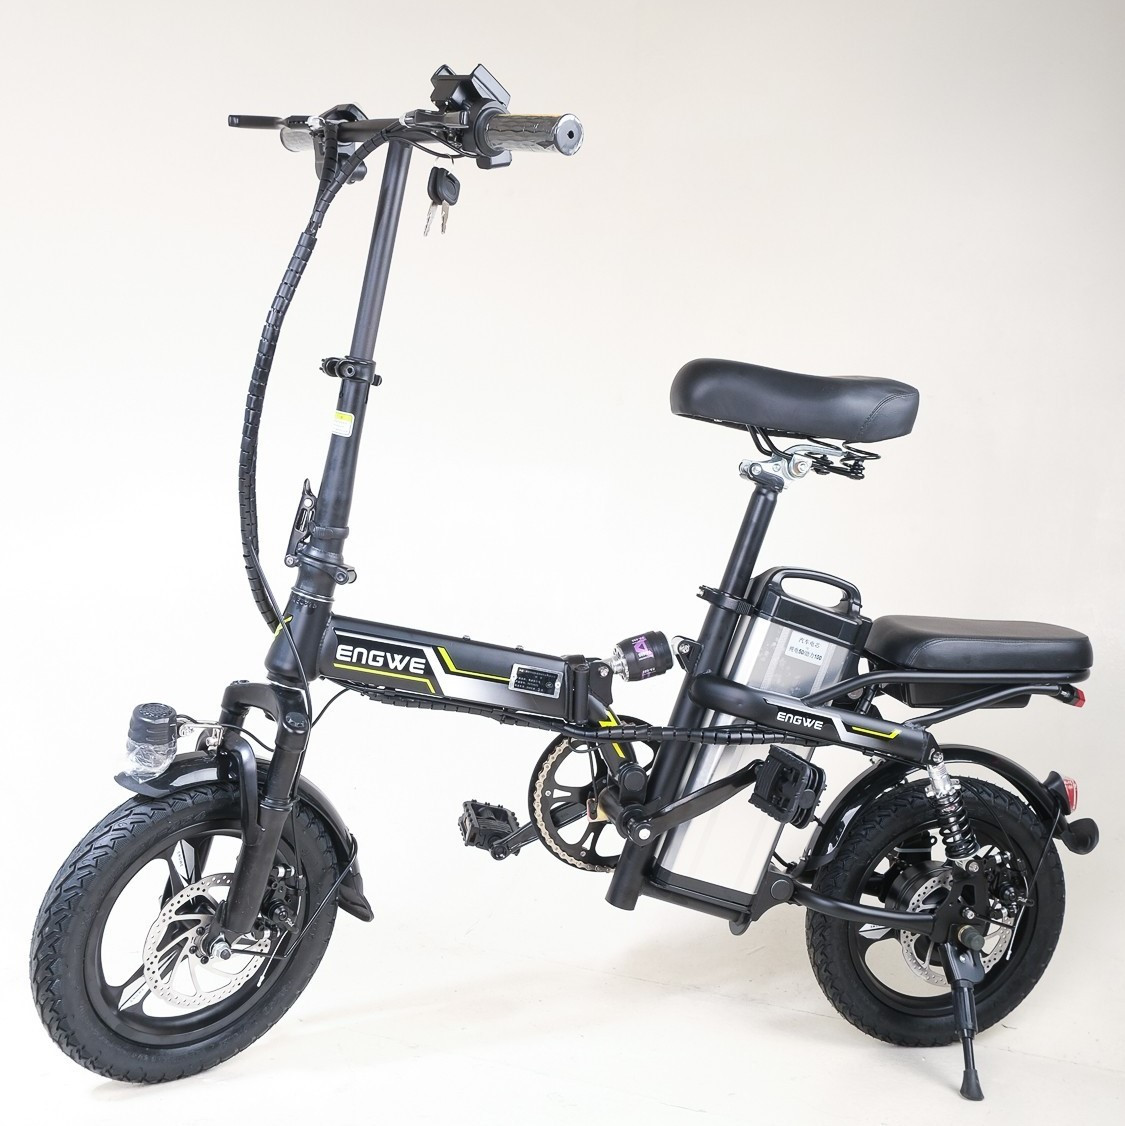 "Электровелосипед Energy CY 14"" | электрический велосипед Энерджи складной со съемной батареей, сити-байк"